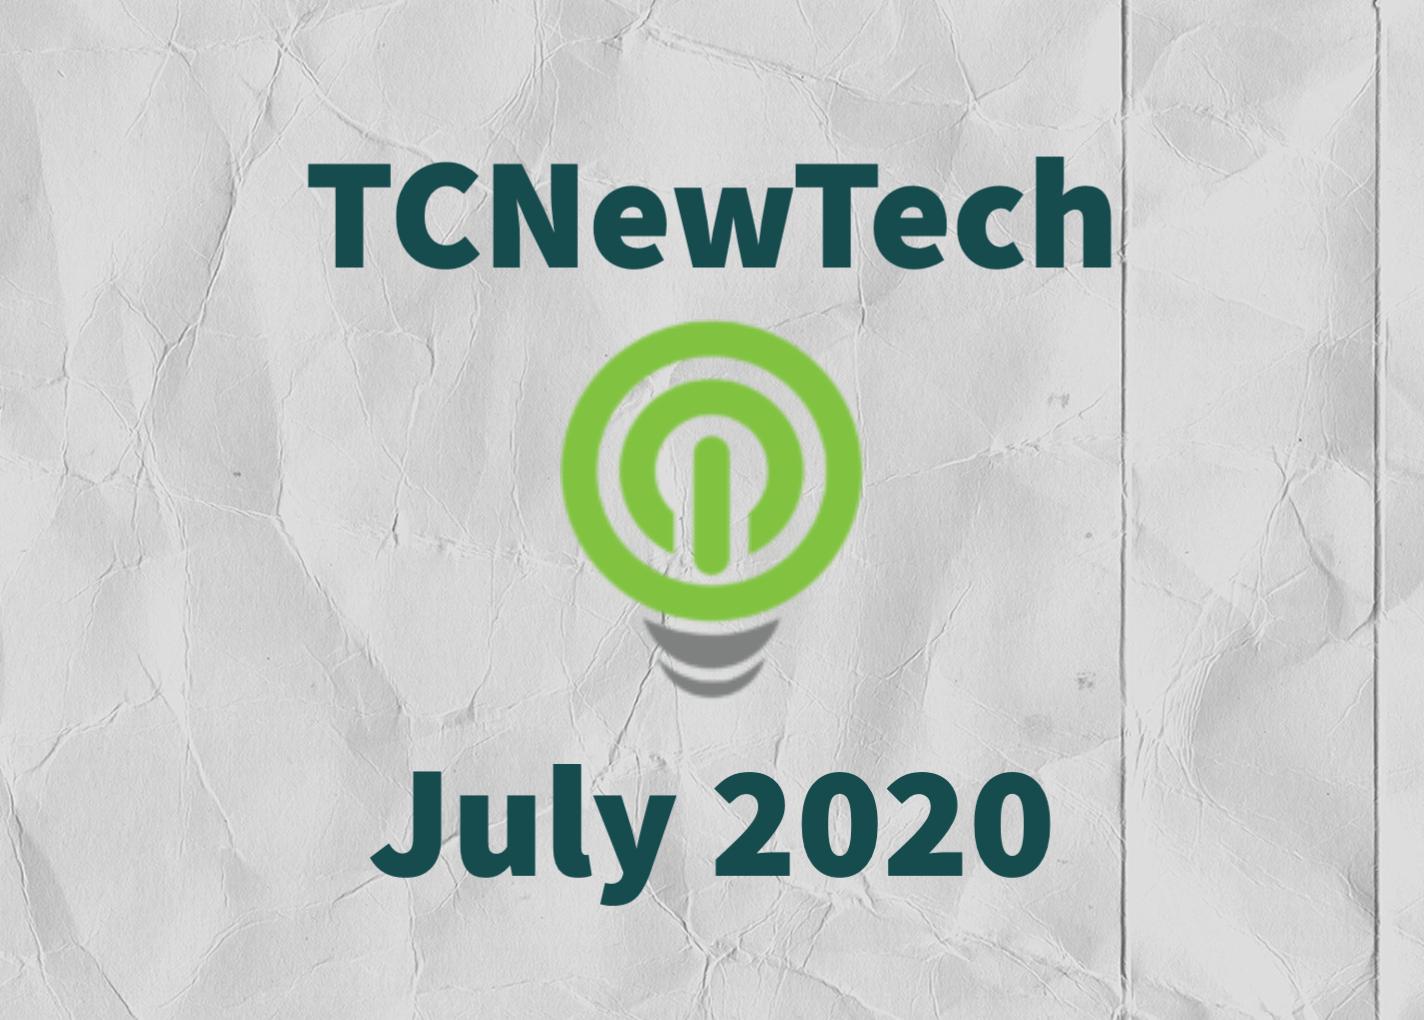 TCNewTech Pitch Contest July 2020